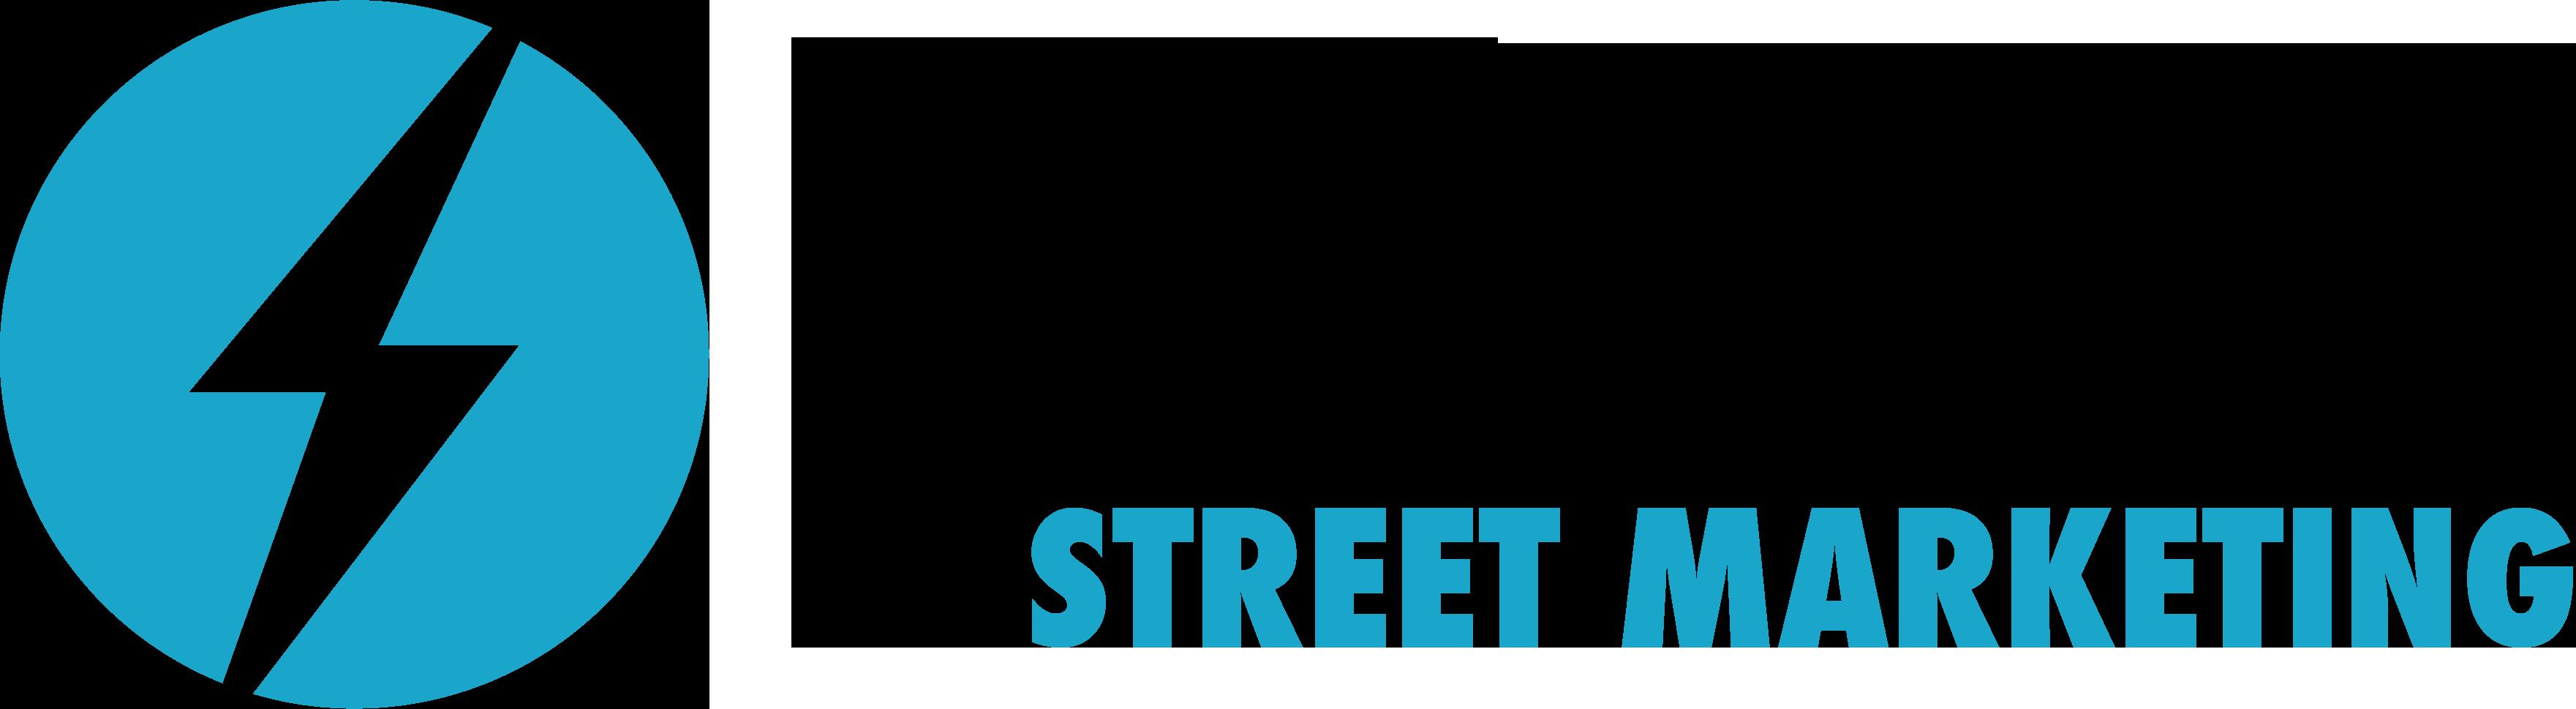 Tonnerre Streetmarketing